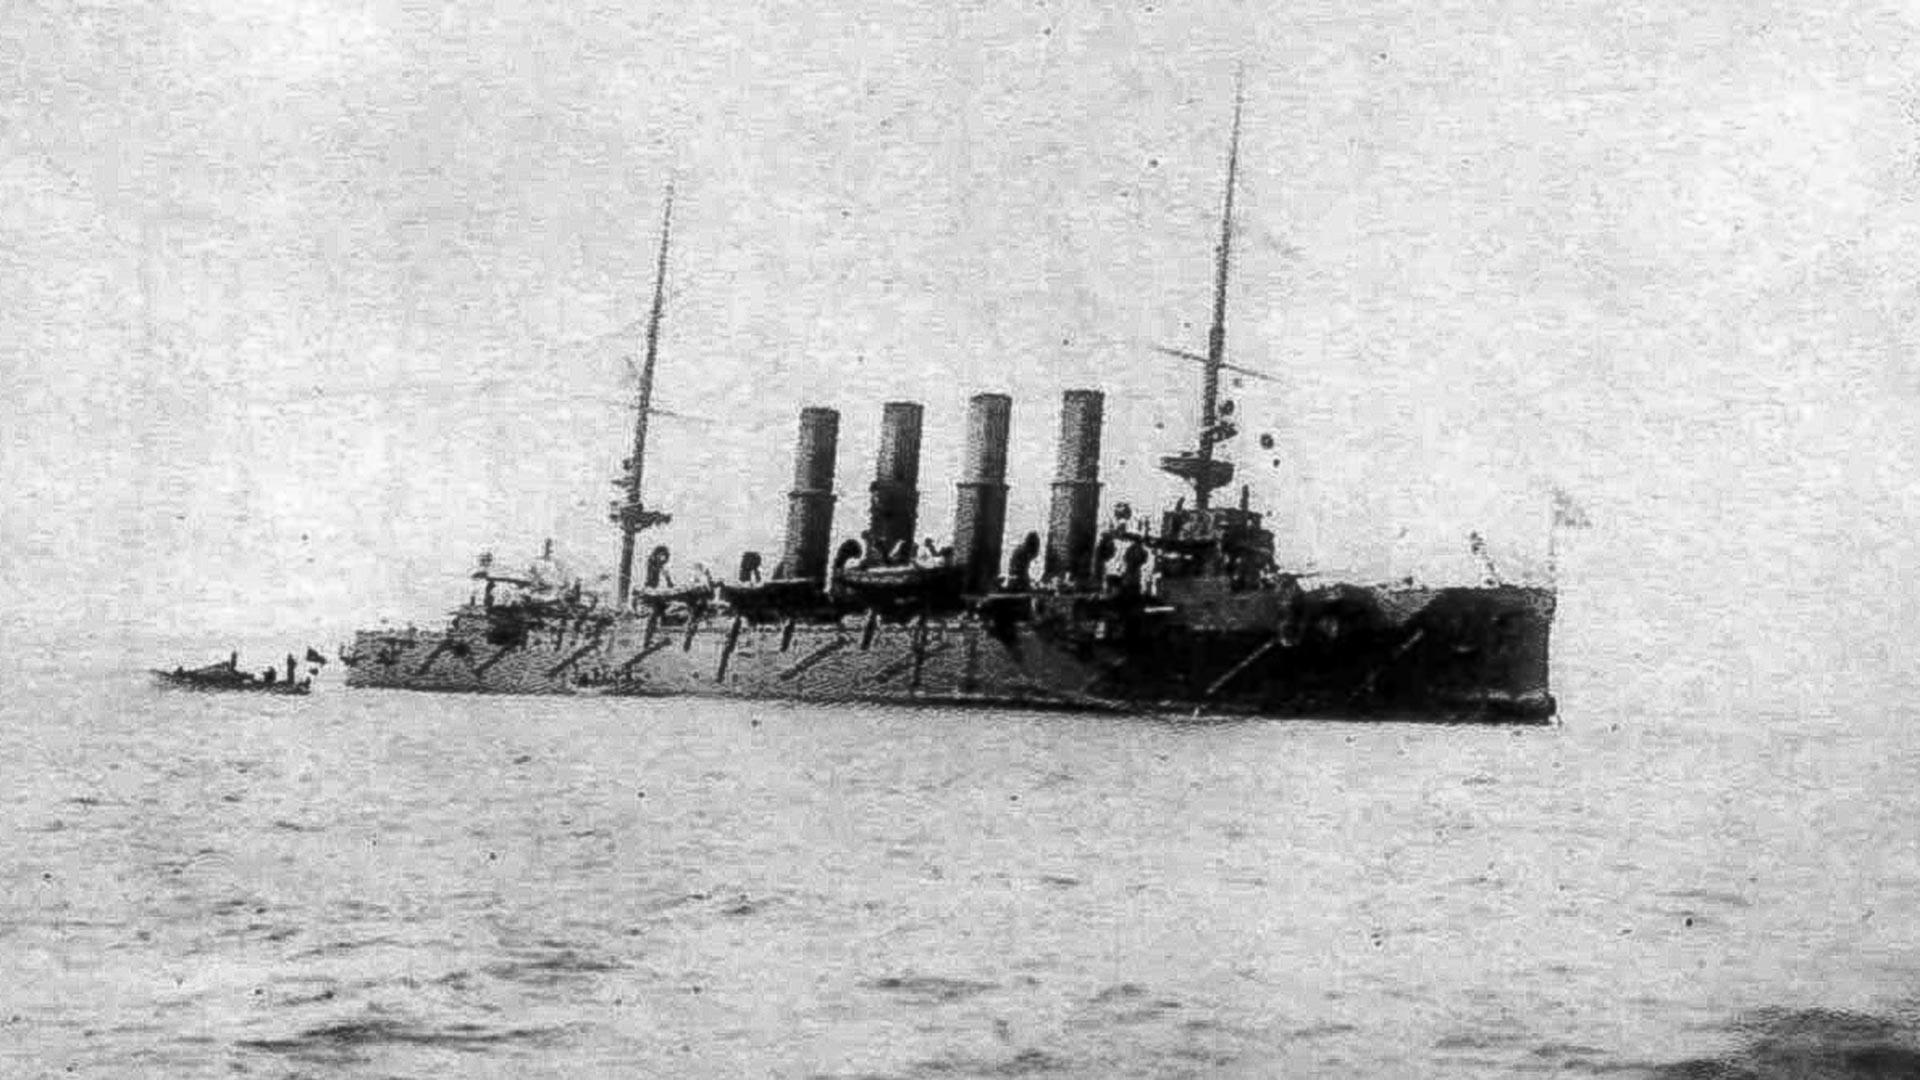 Varyag après la bataille